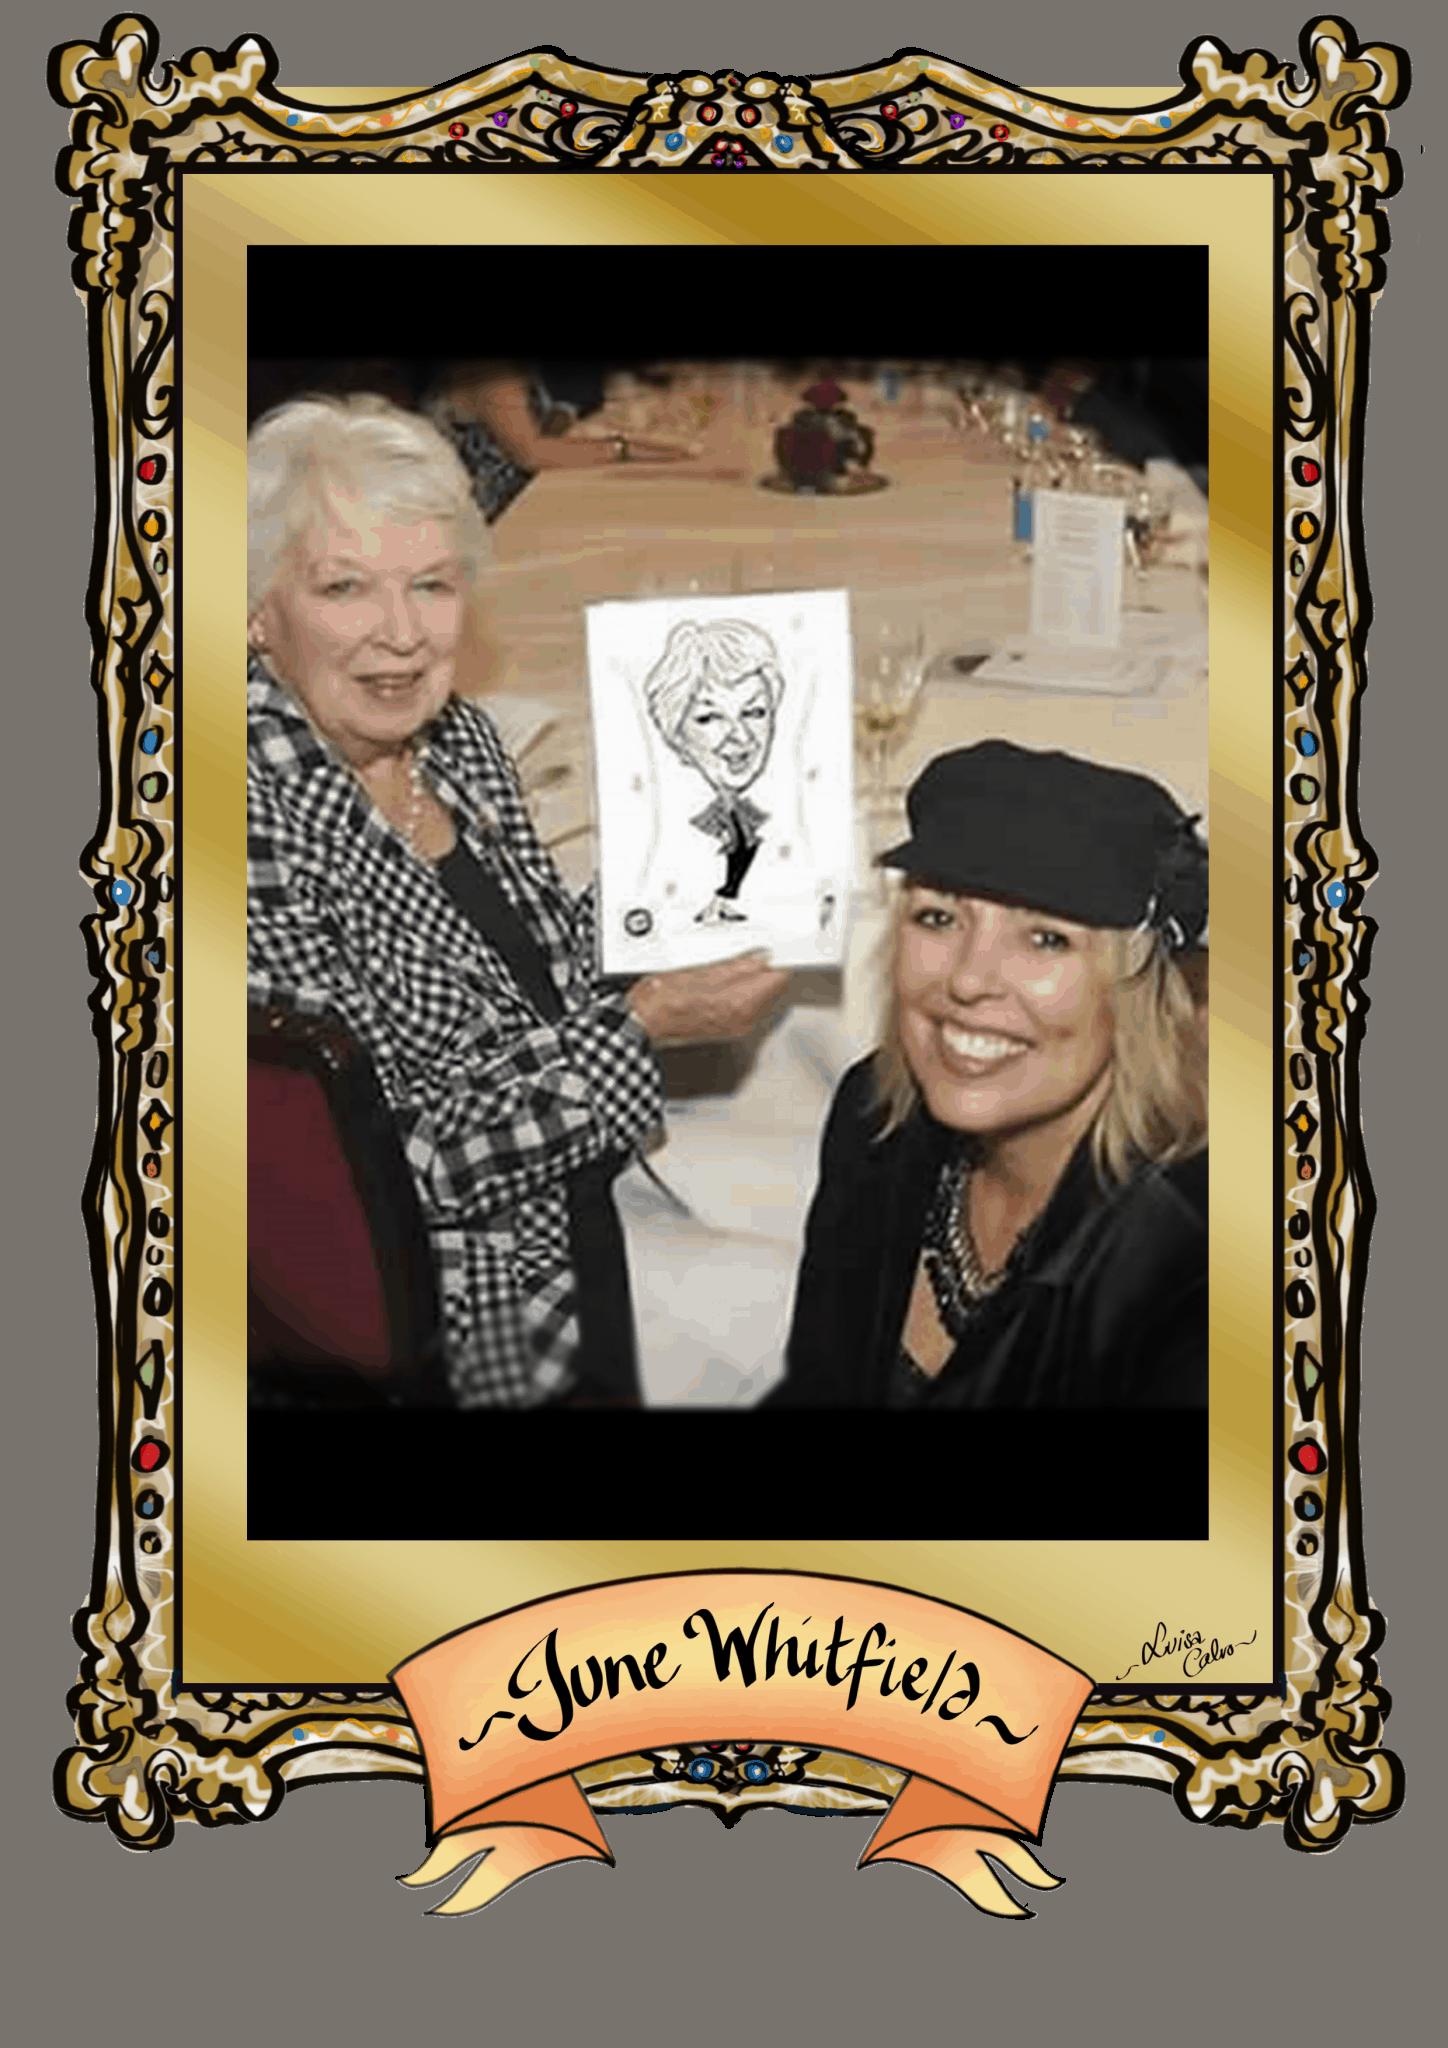 JUNE WHITFIELD CARICATURE BY LUISA CALVO